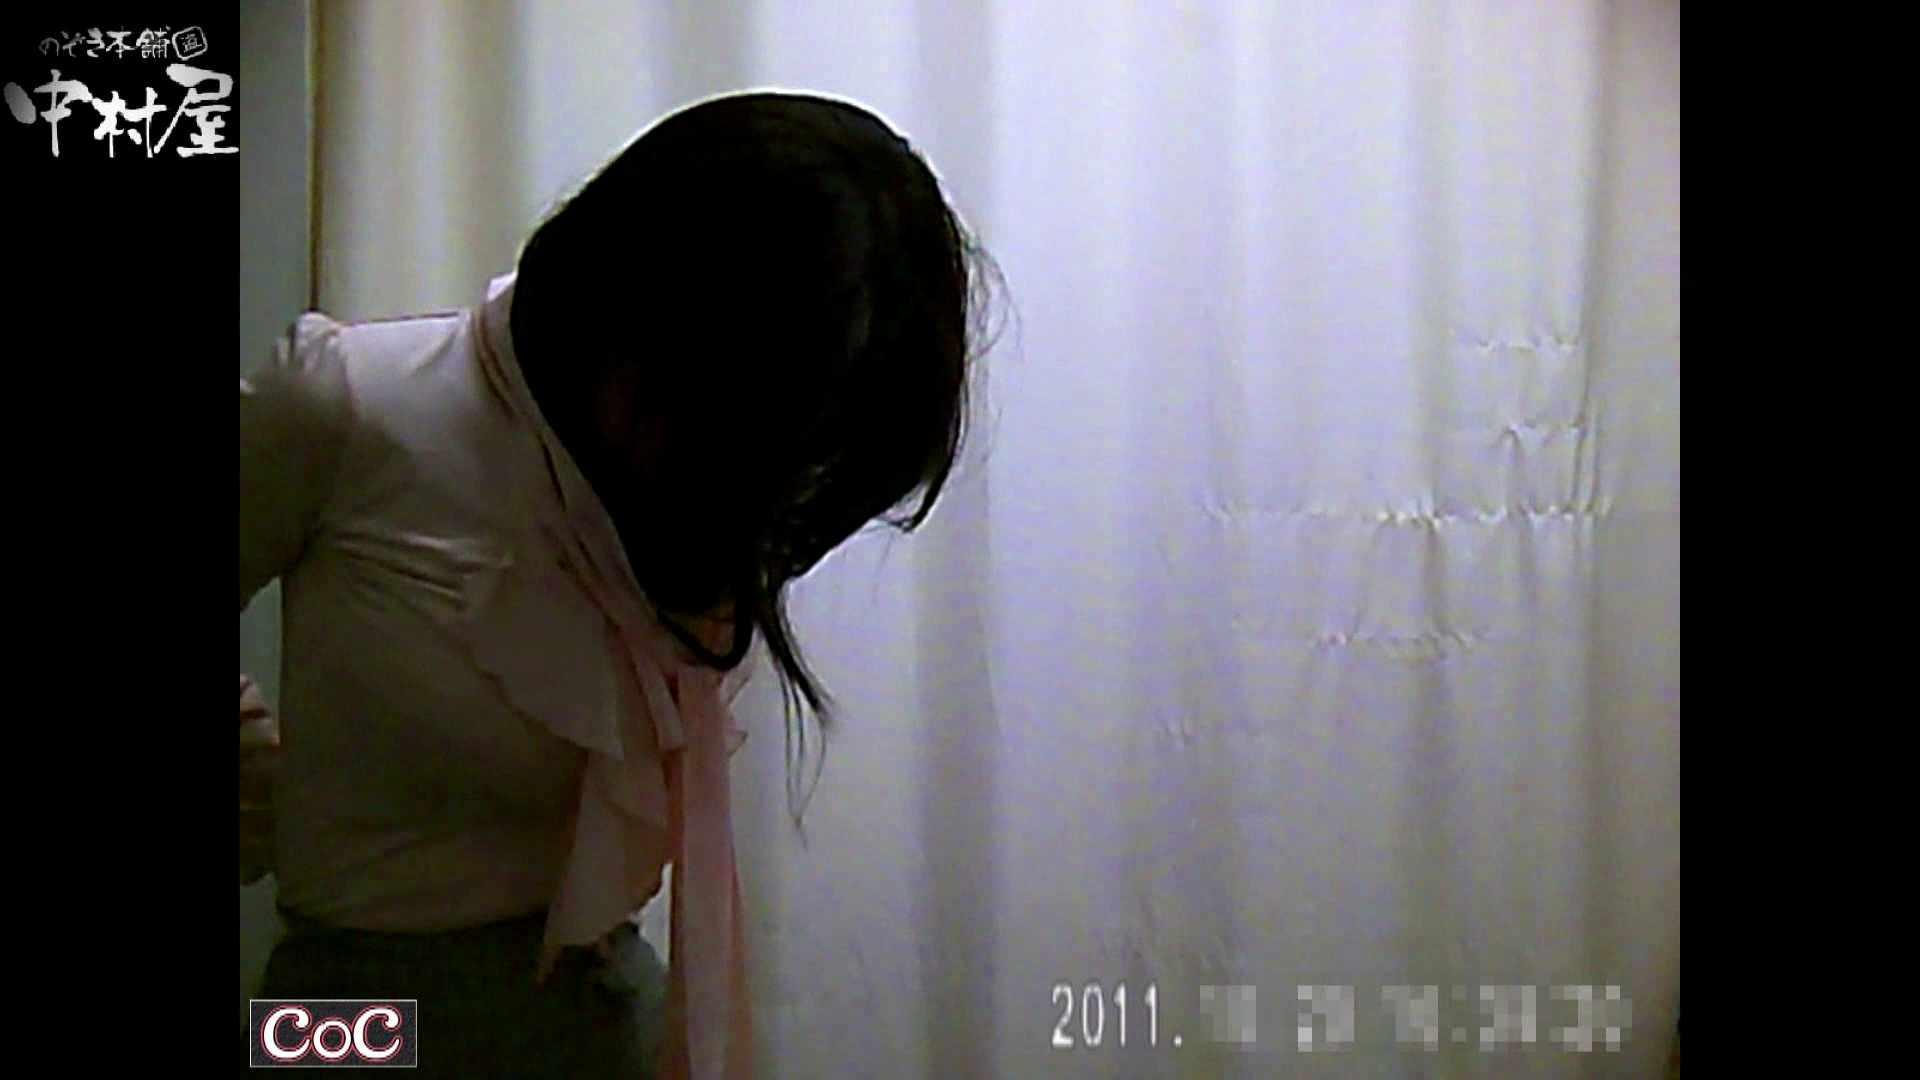 Doctor-X元医者による反抗vol.63 OLハメ撮り  61Pix 7